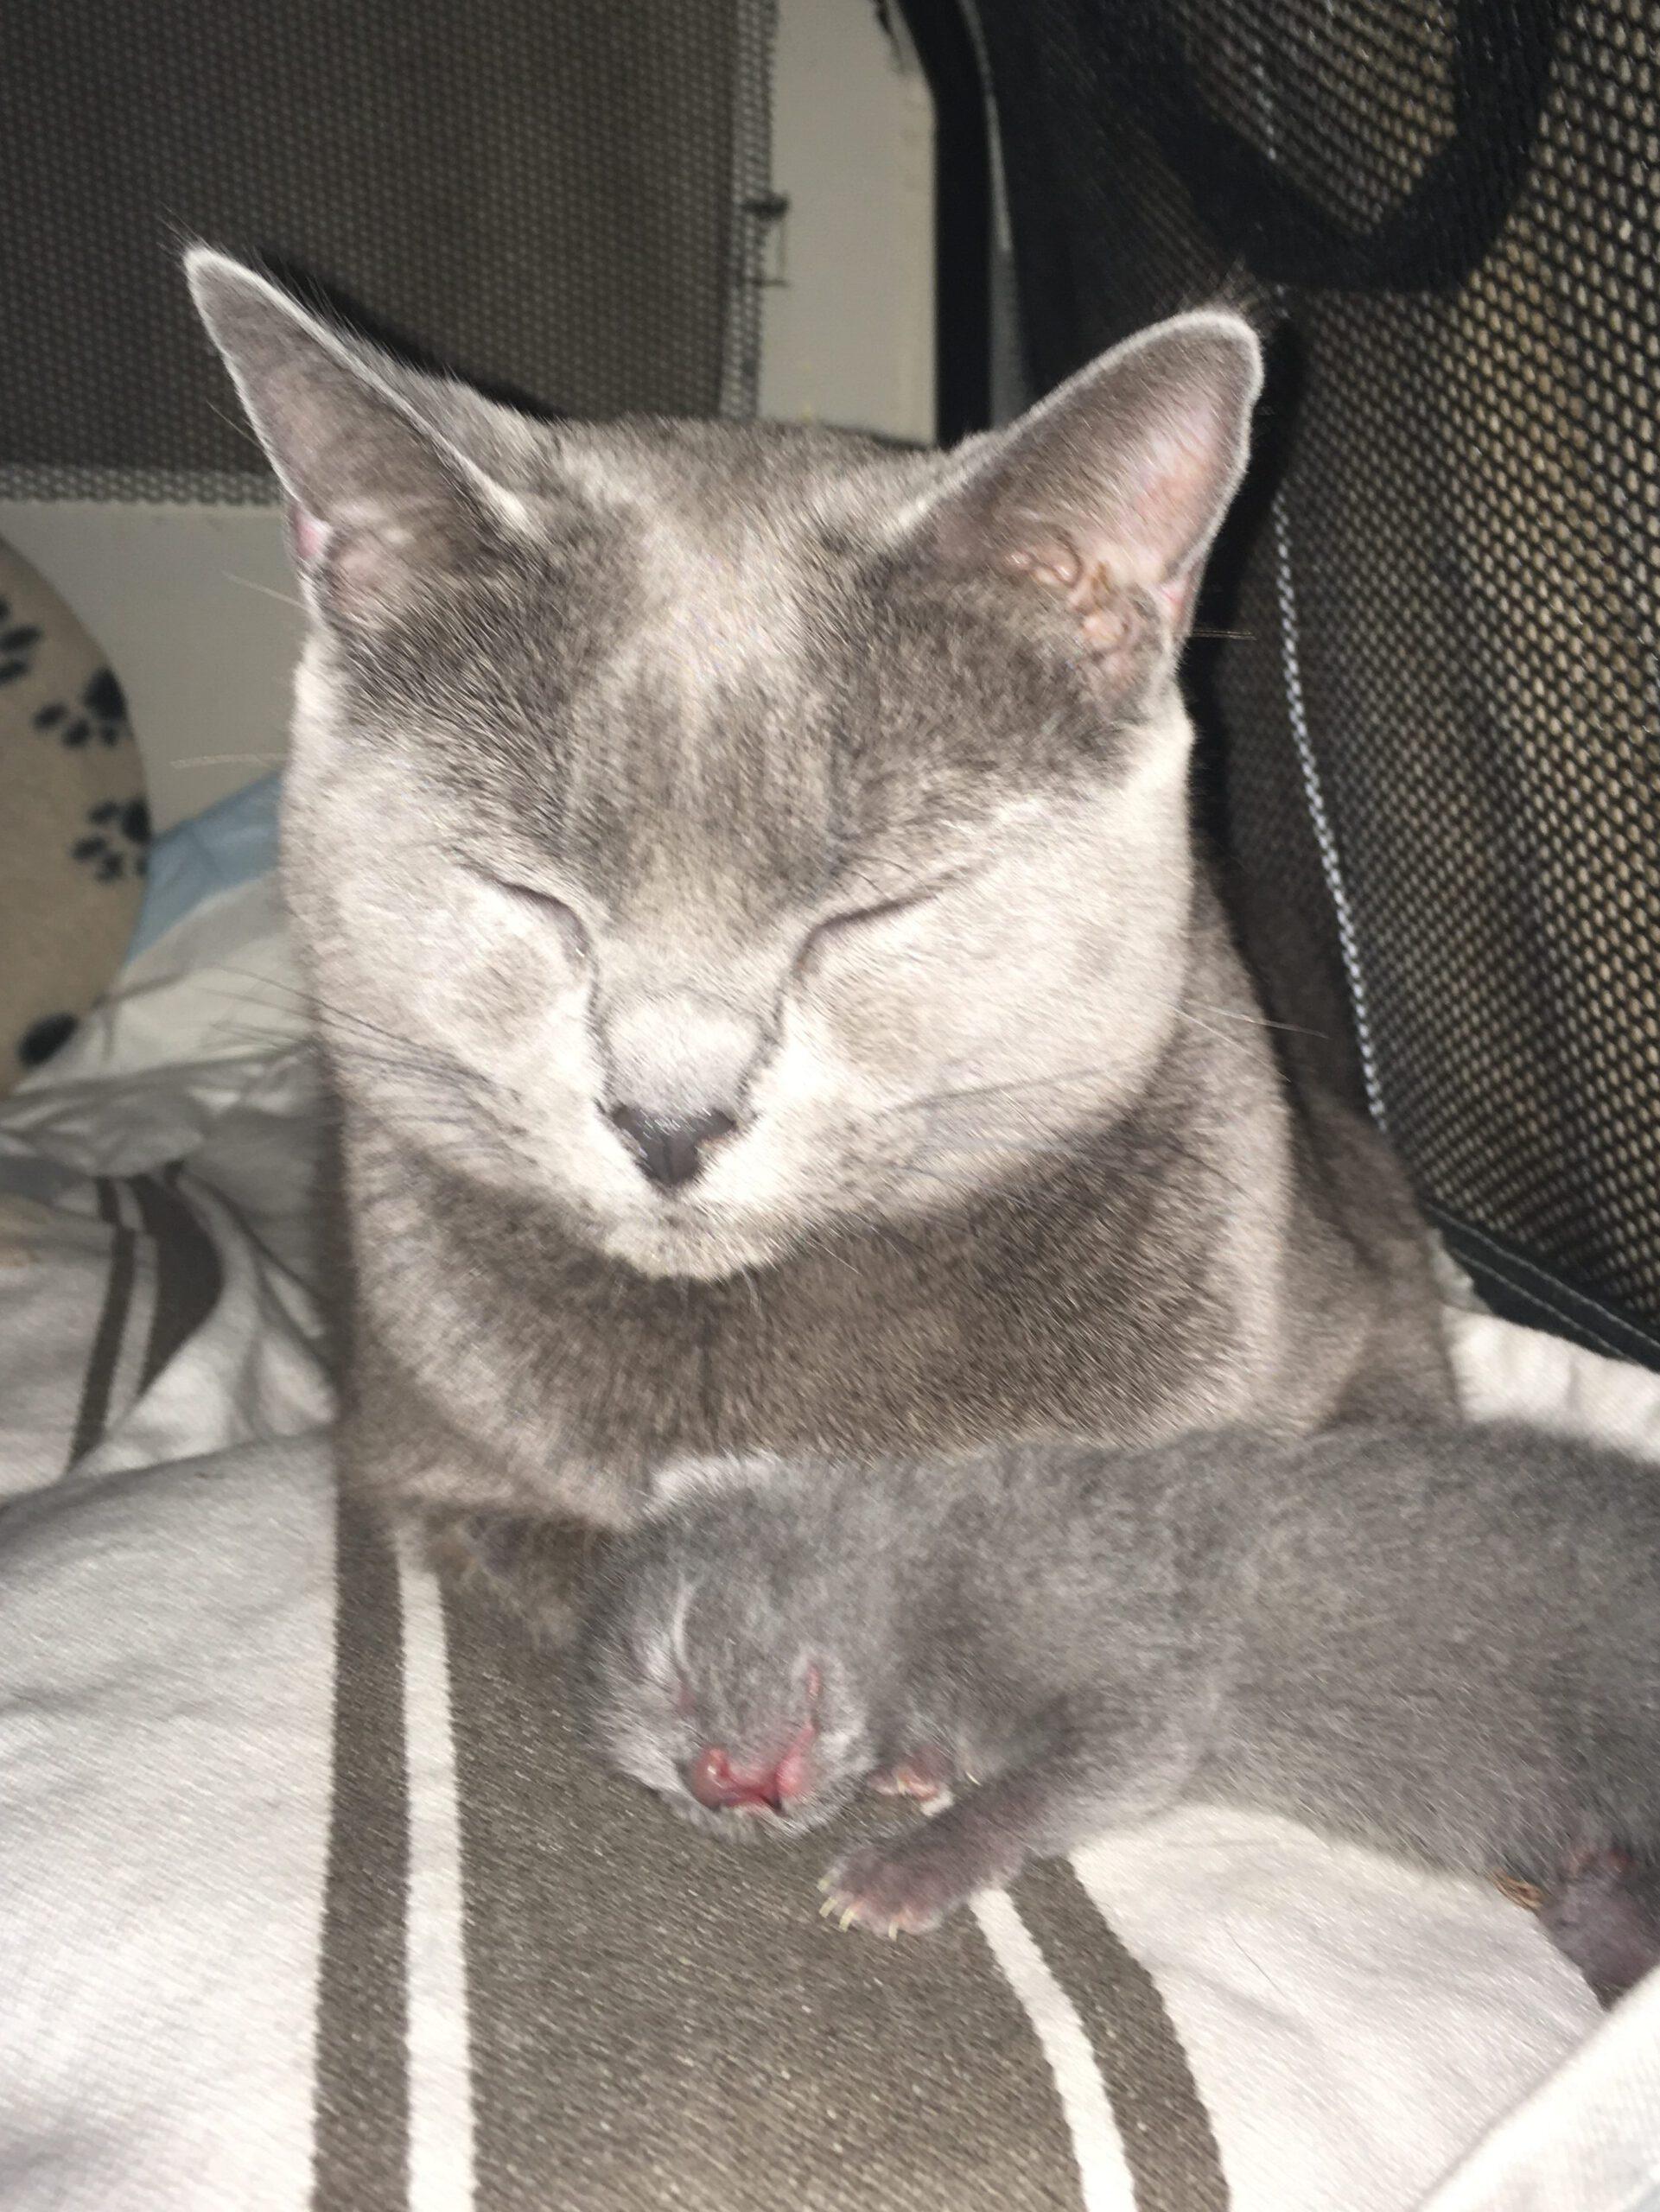 Mutter Kamoi und Sohn Benjamin (2 Tage alt)